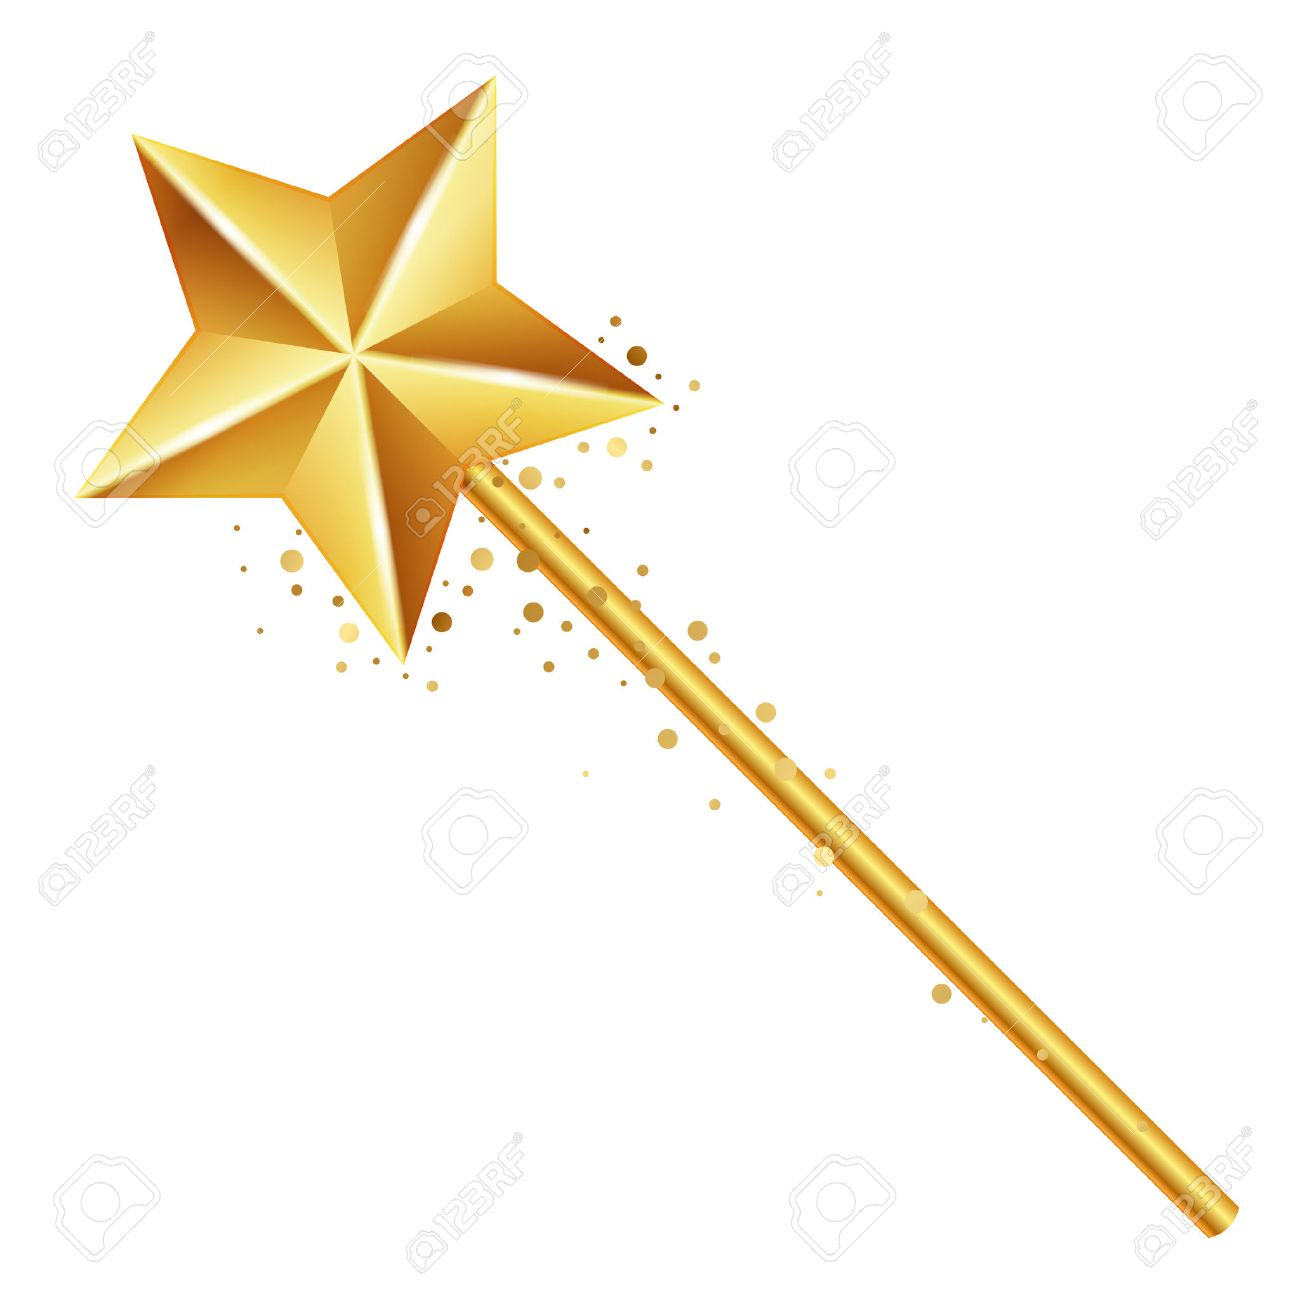 Vector illustration of golden magic wand.